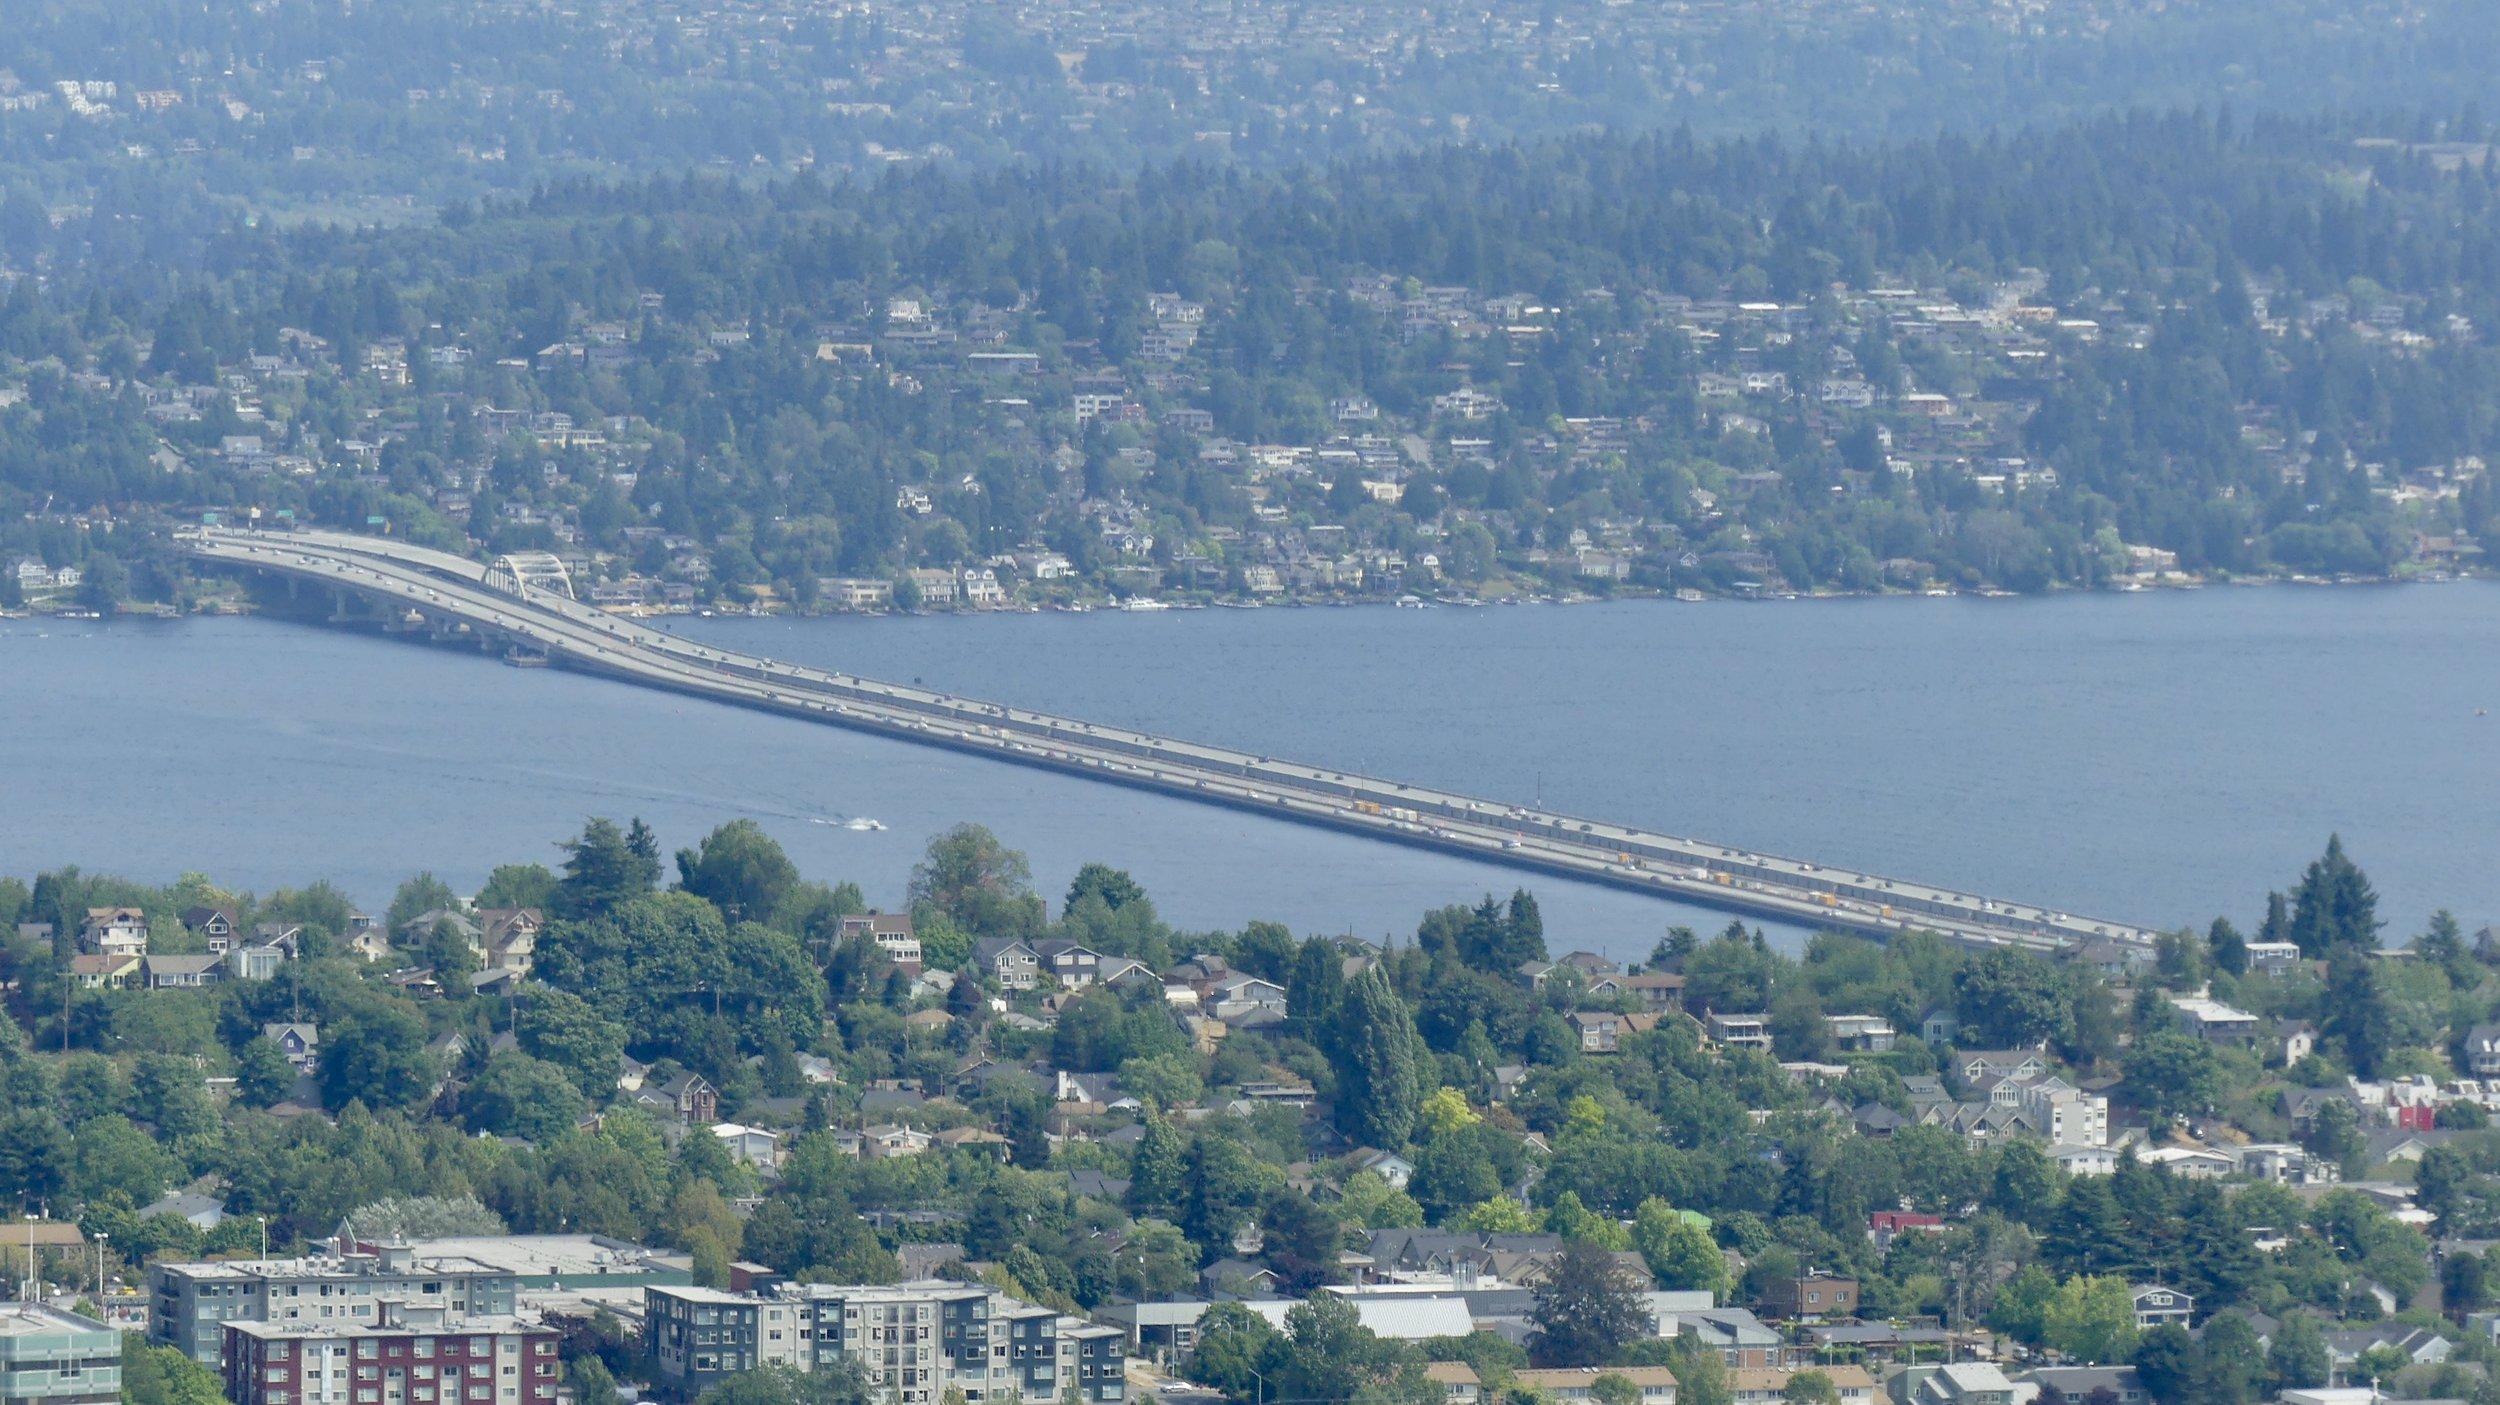 Evergreen Point Floating Bridge, the longest in the world (2350 metres), across Lake Washington